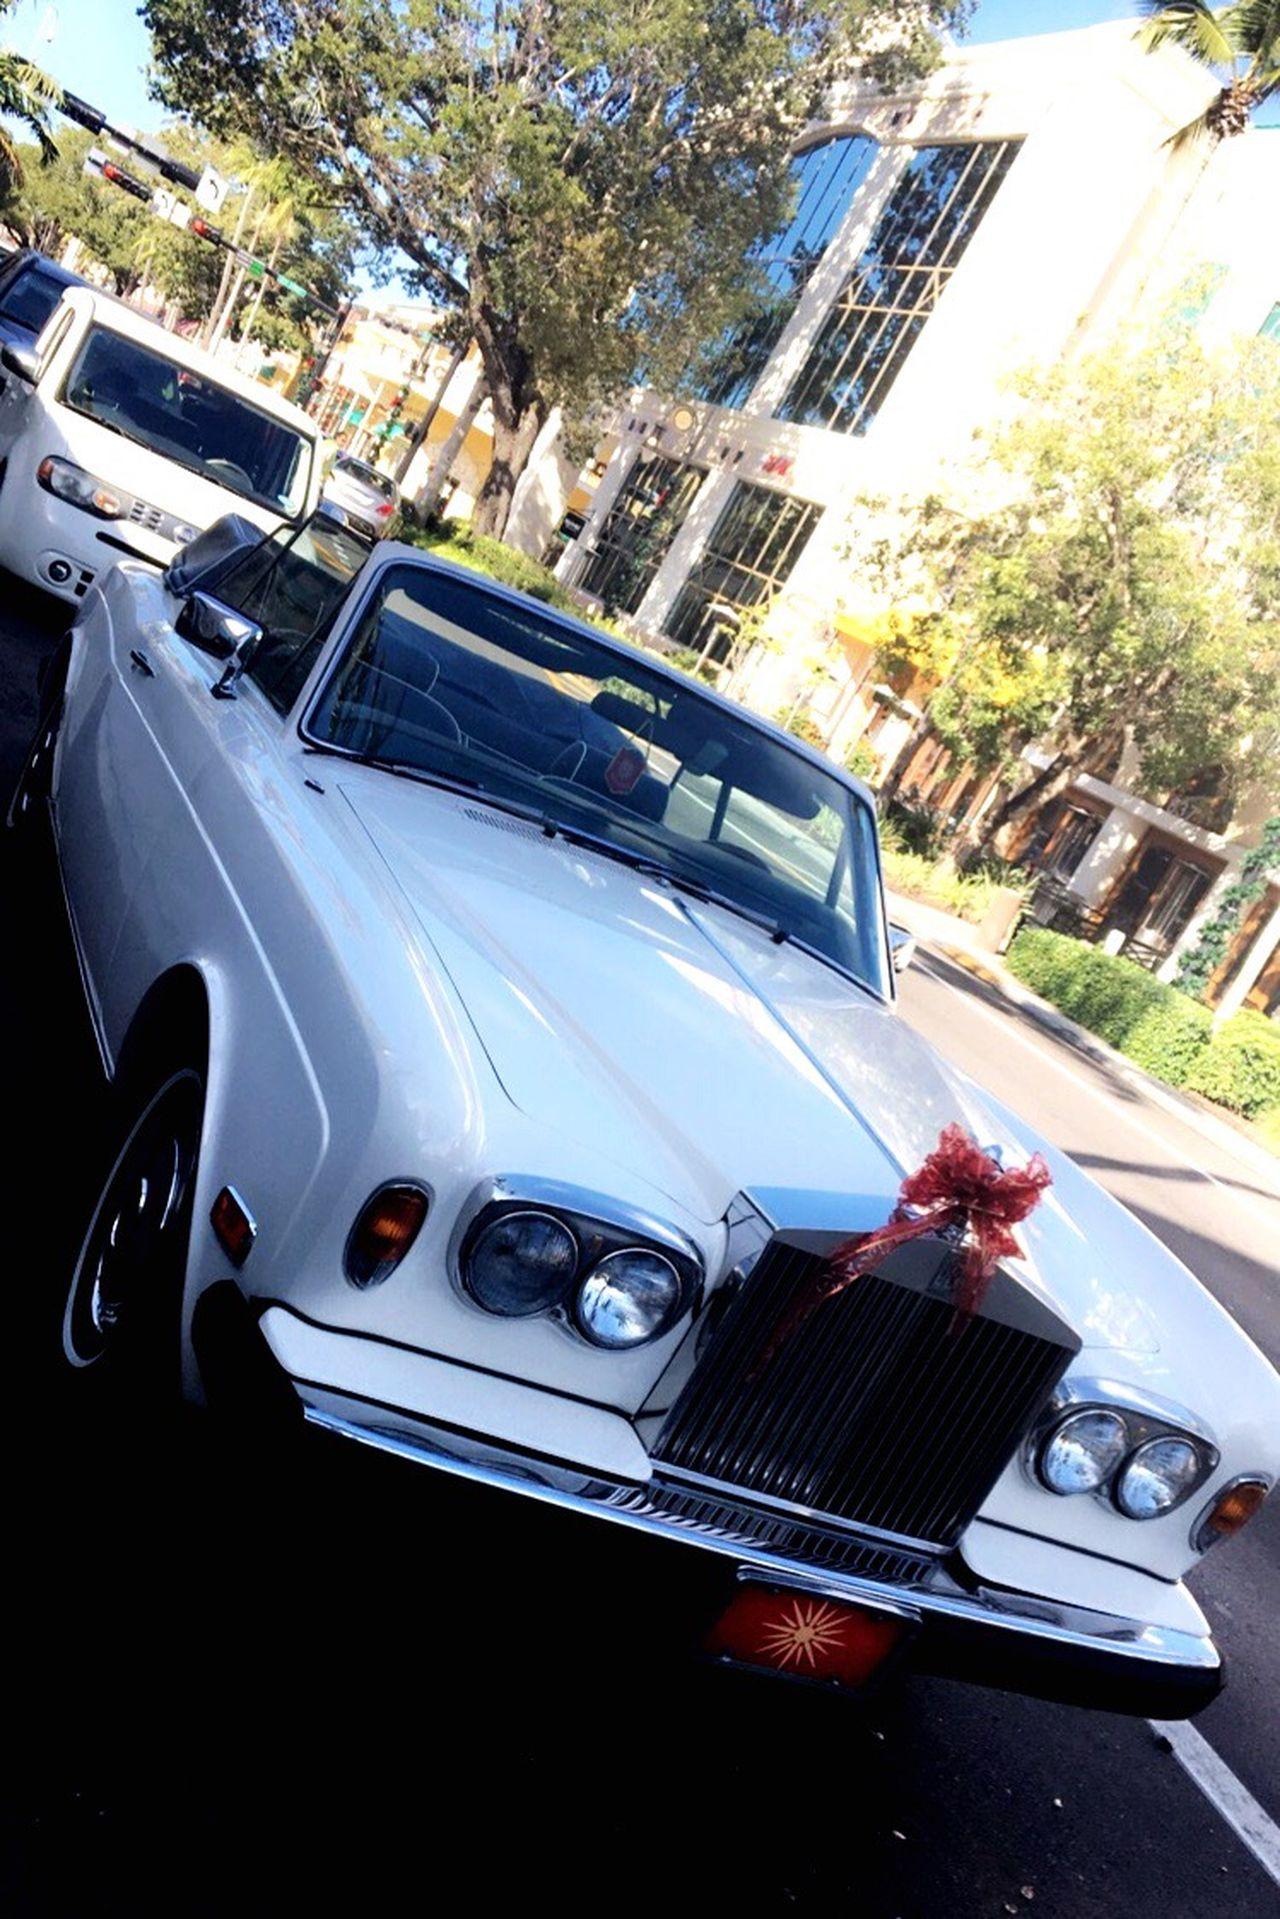 Rolls Royce Naplesflorida 3rd Street